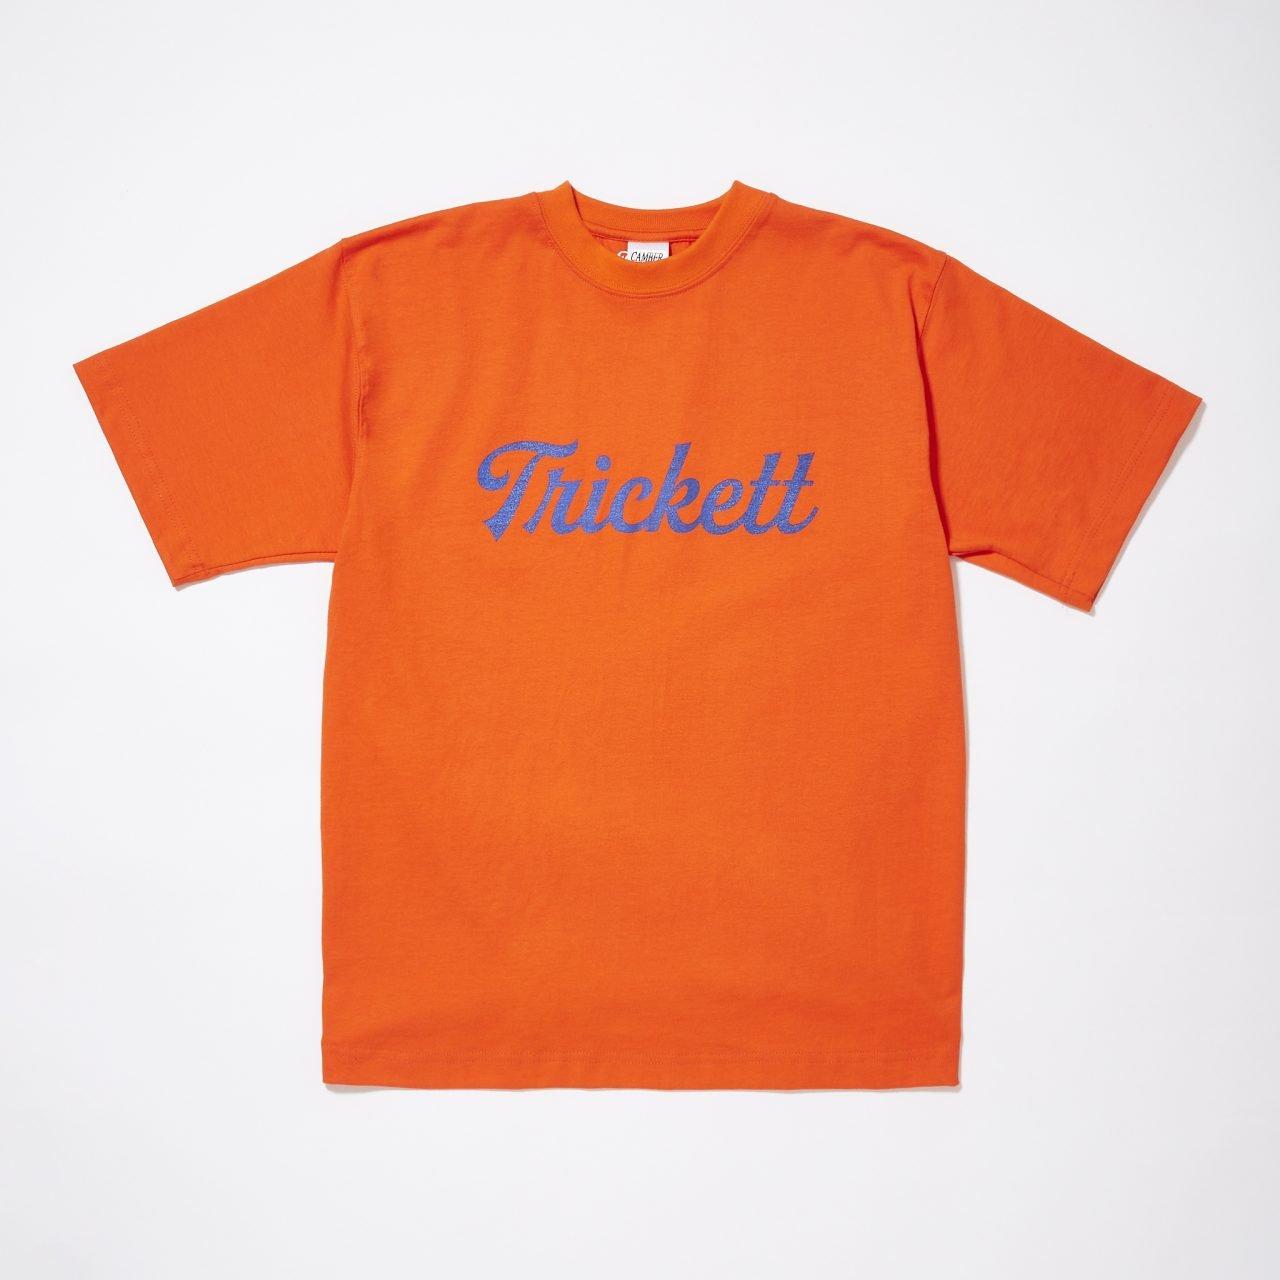 Camber x TRiCKETT Orange T-Shirt